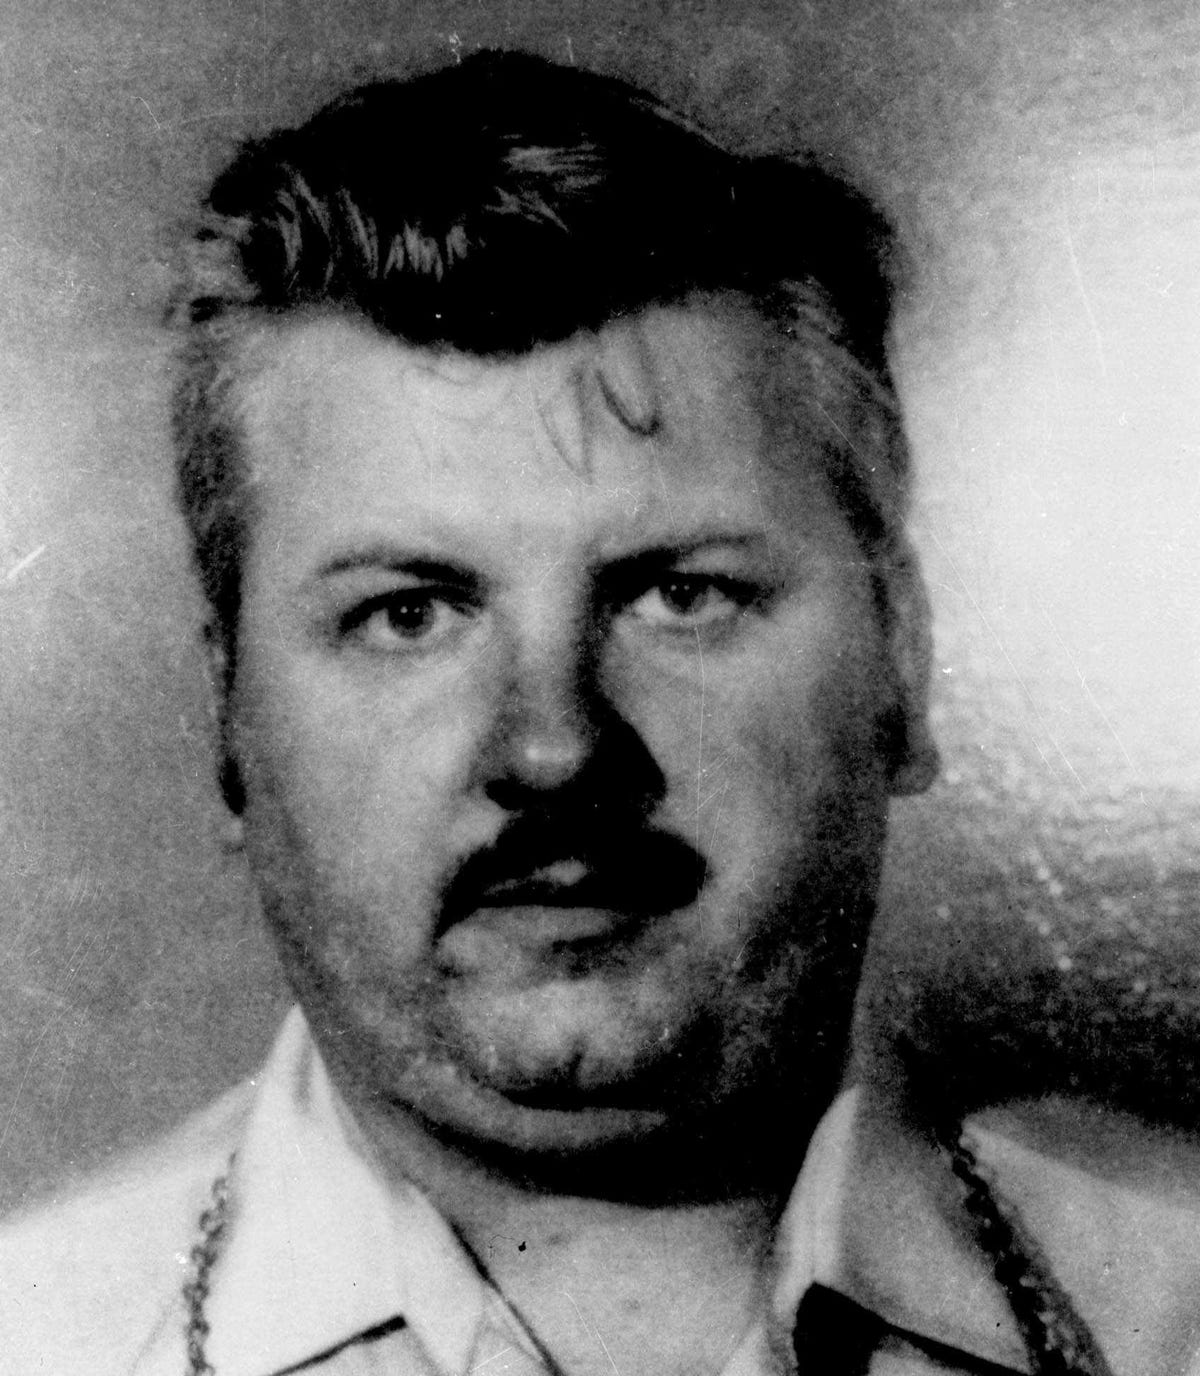 Indiana killings a reminder of John Wayne Gacy